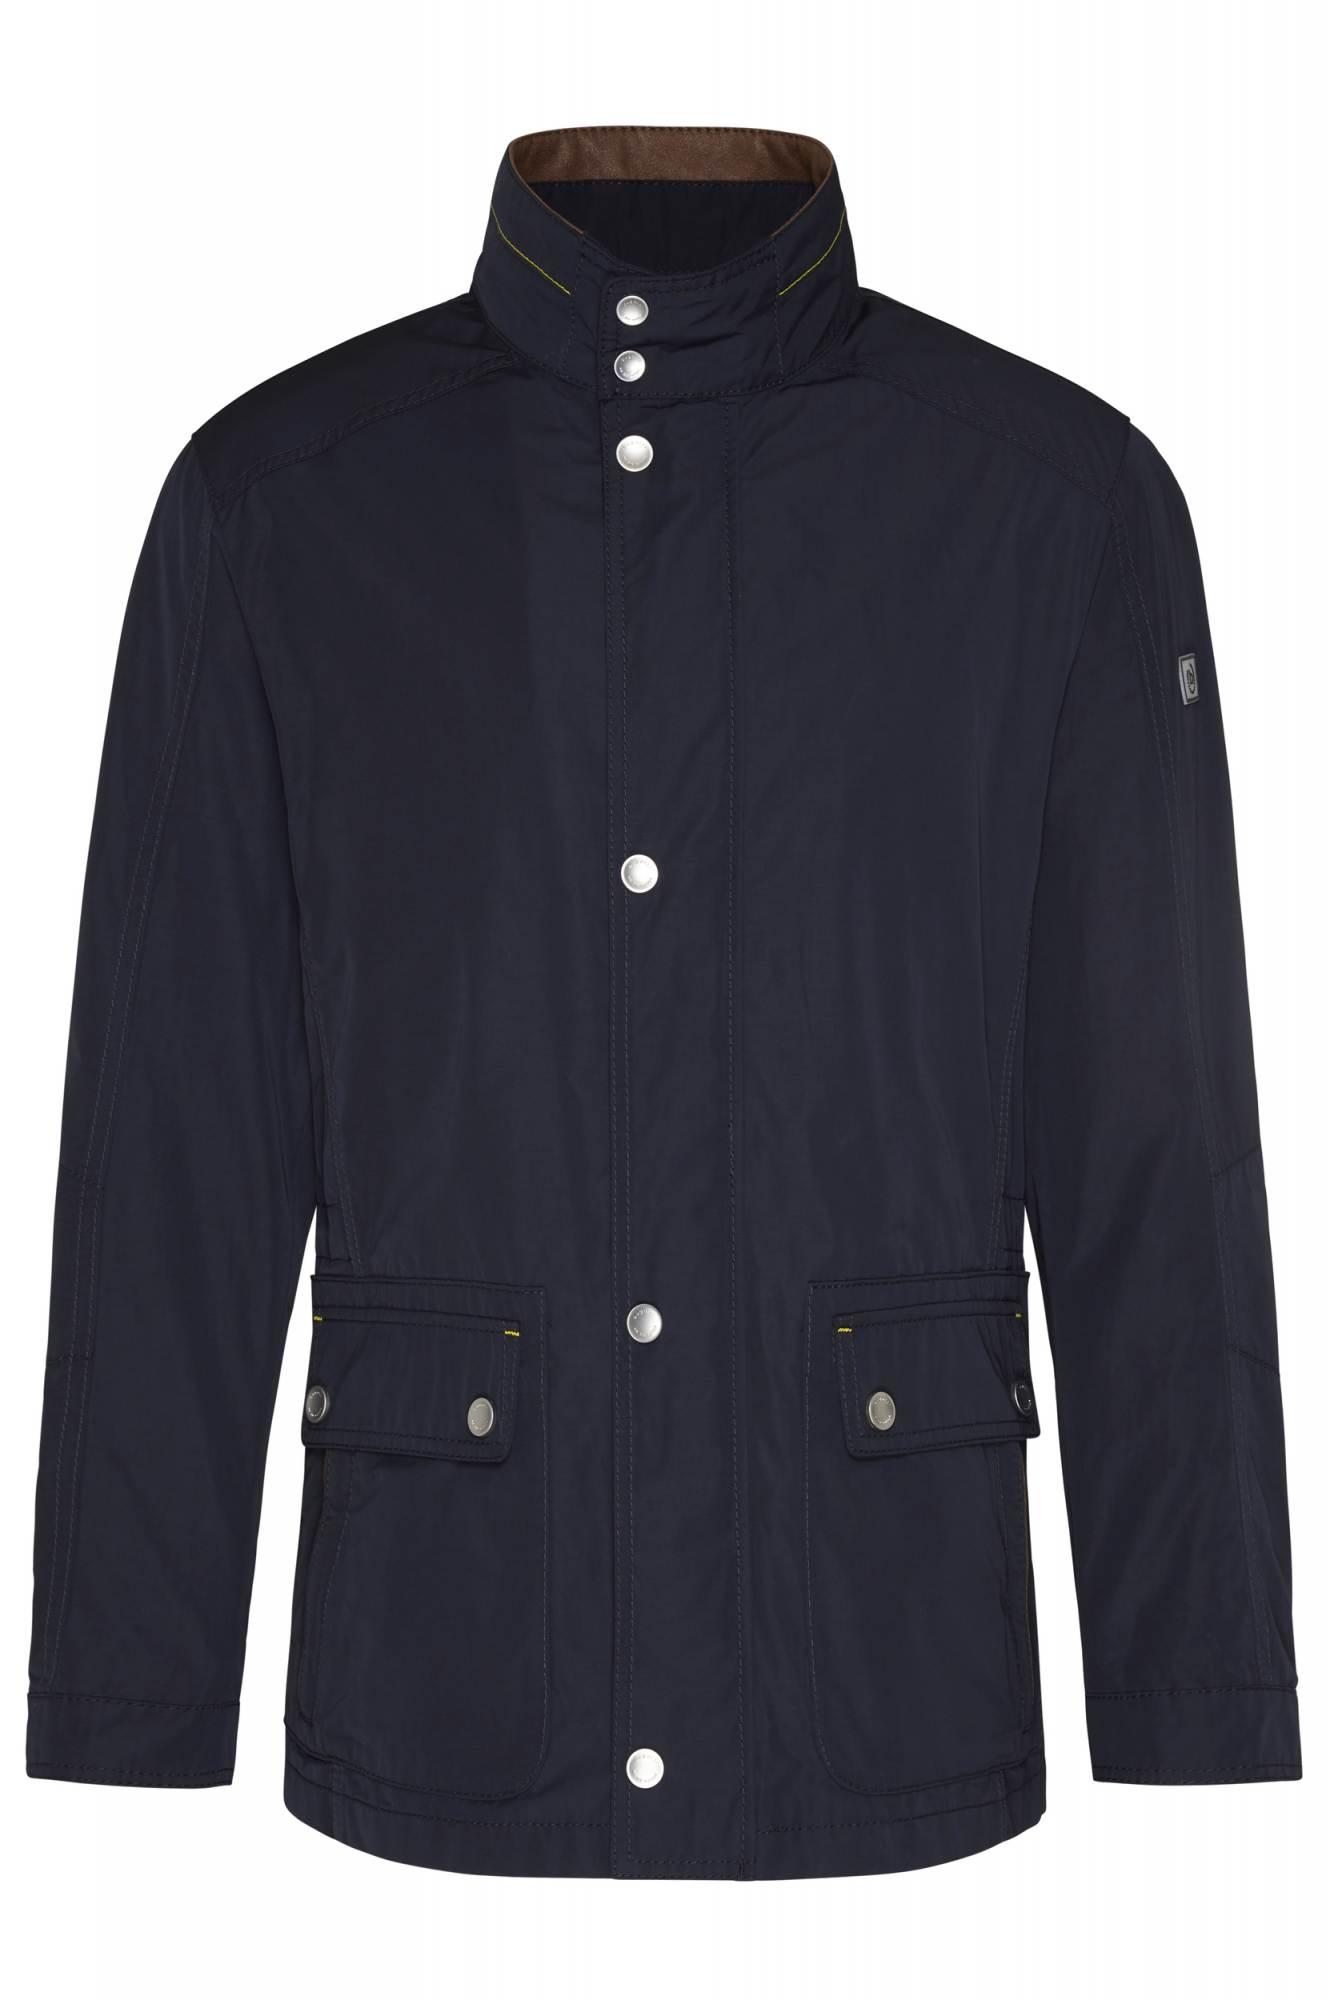 bug 772800 79016 380 f - - Con Murphys Menswear